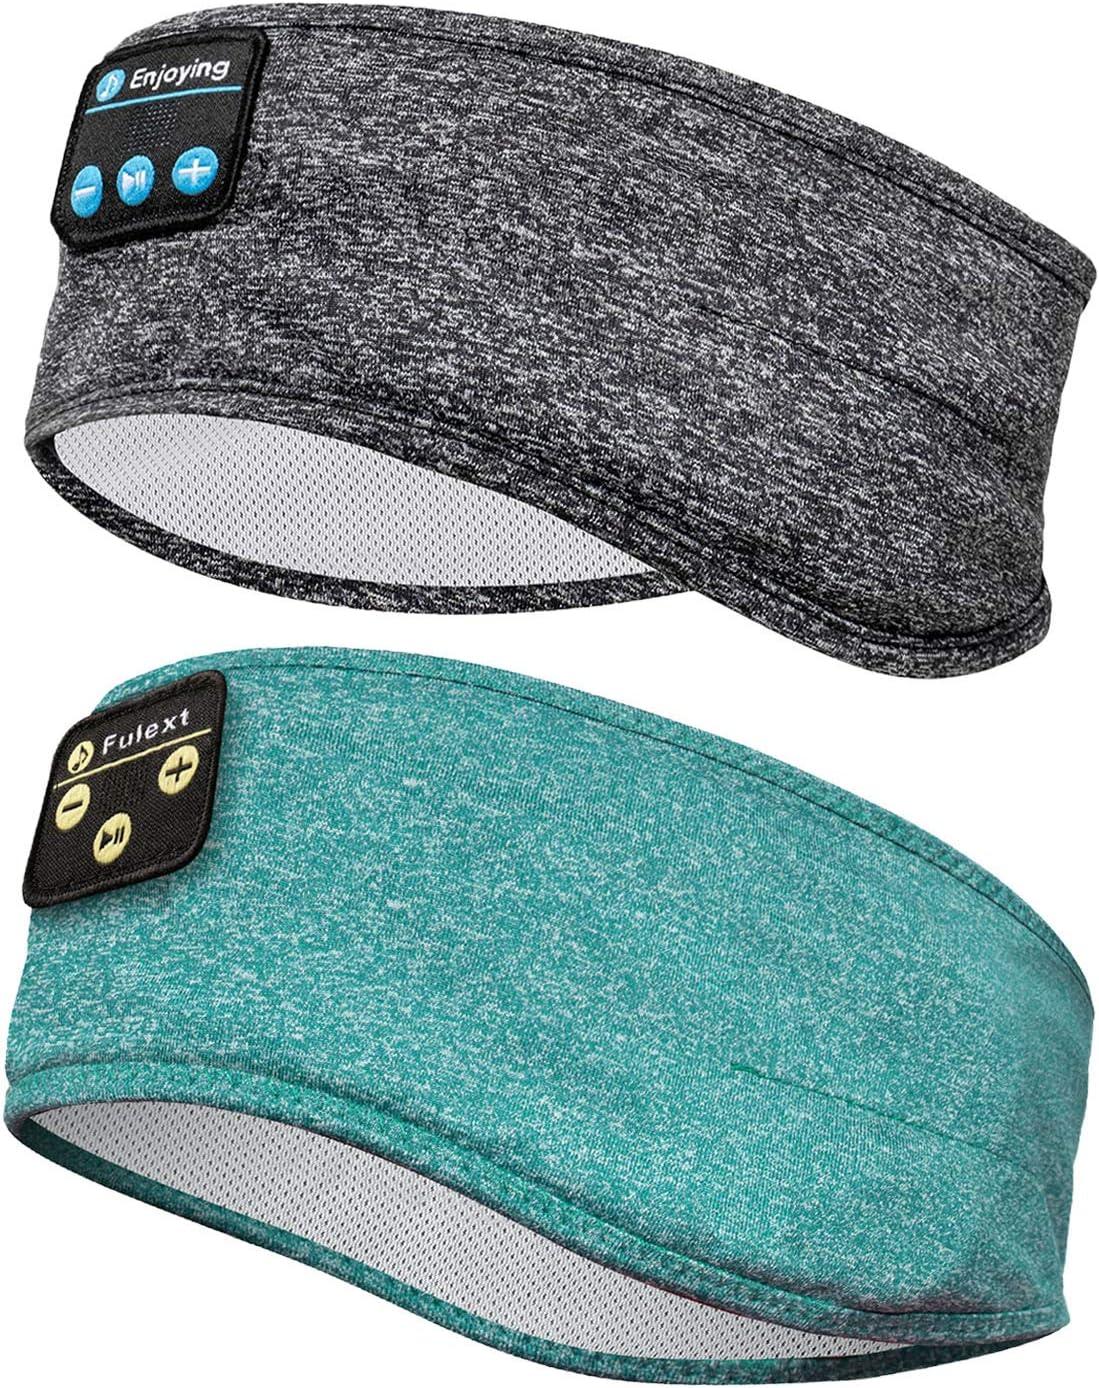 Sleep Headphones Bluetooth Headband, Perytong Sports Bluetooth Headband Headphones with Thin Speakers, Sleep Earbuds, Sleeping Headphones for Workout Running Yoga Nap, Gift for Men and Women